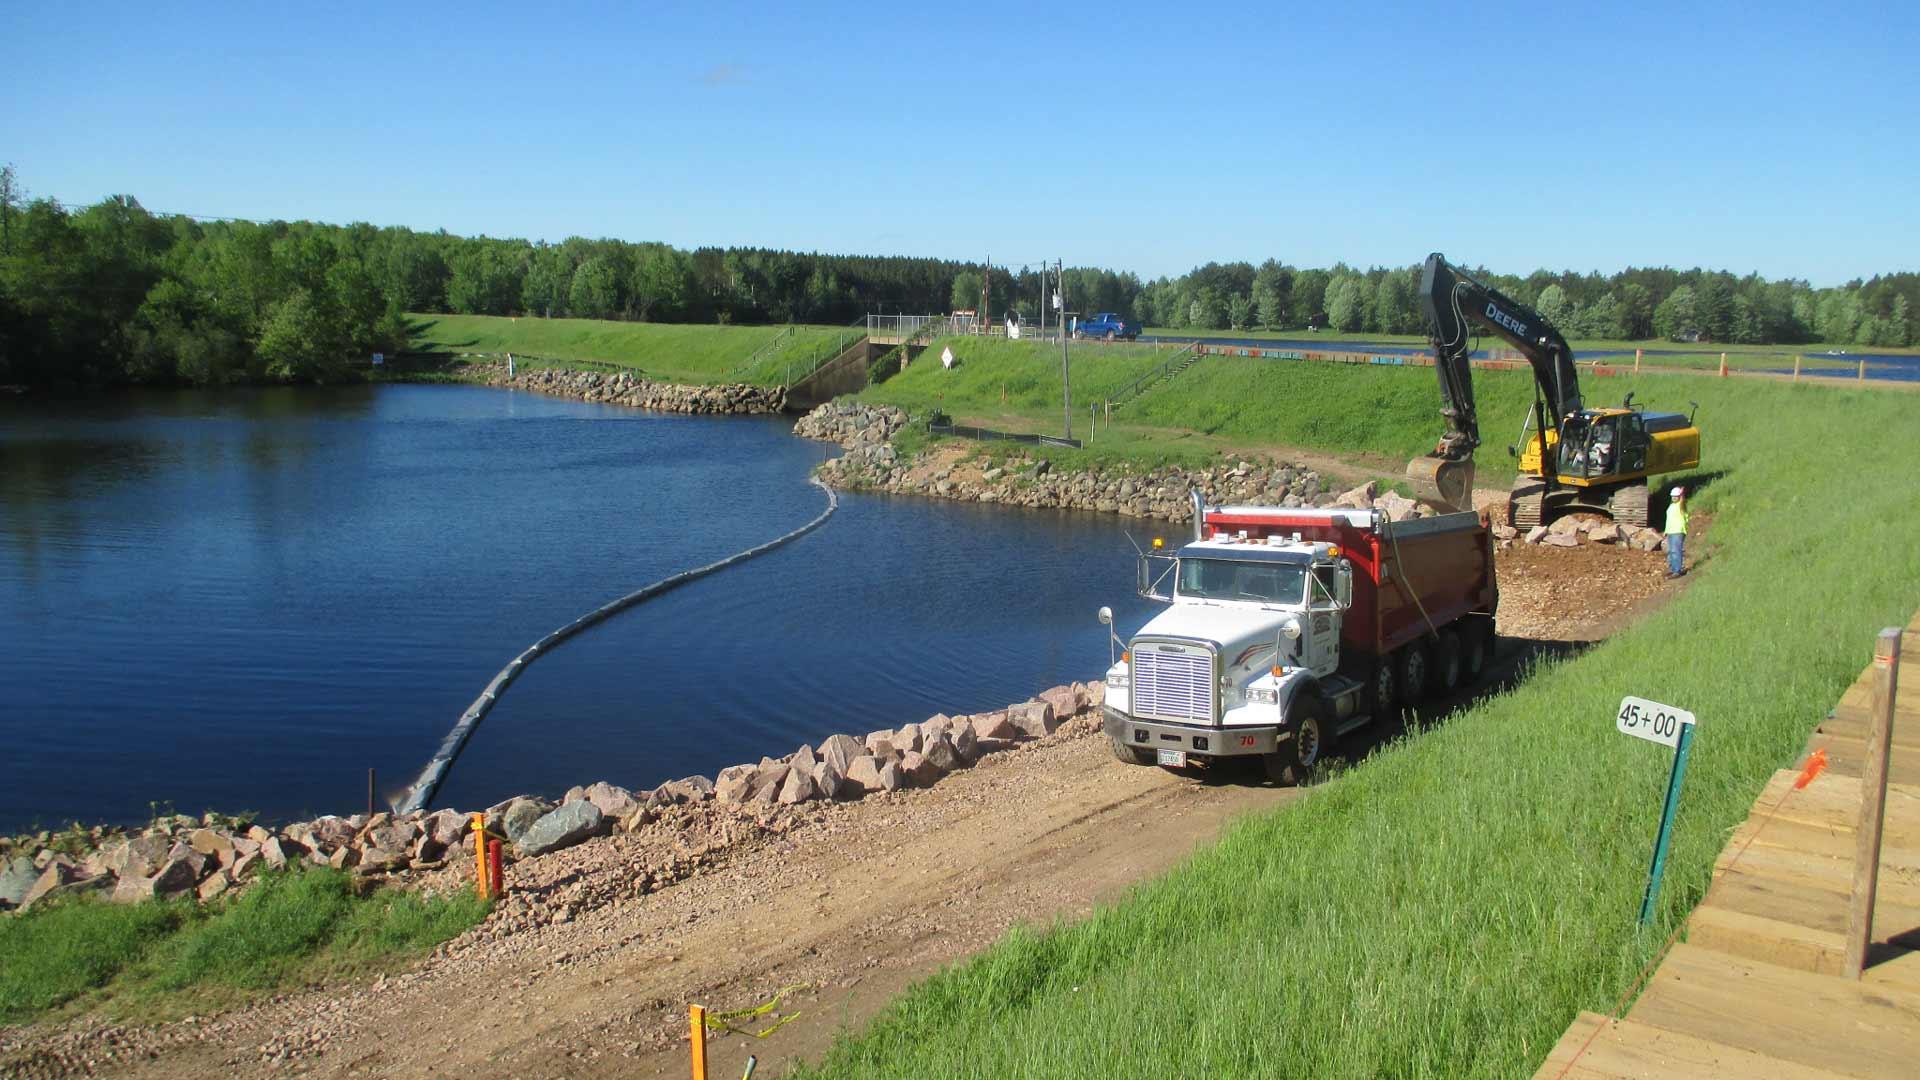 Dam construction site